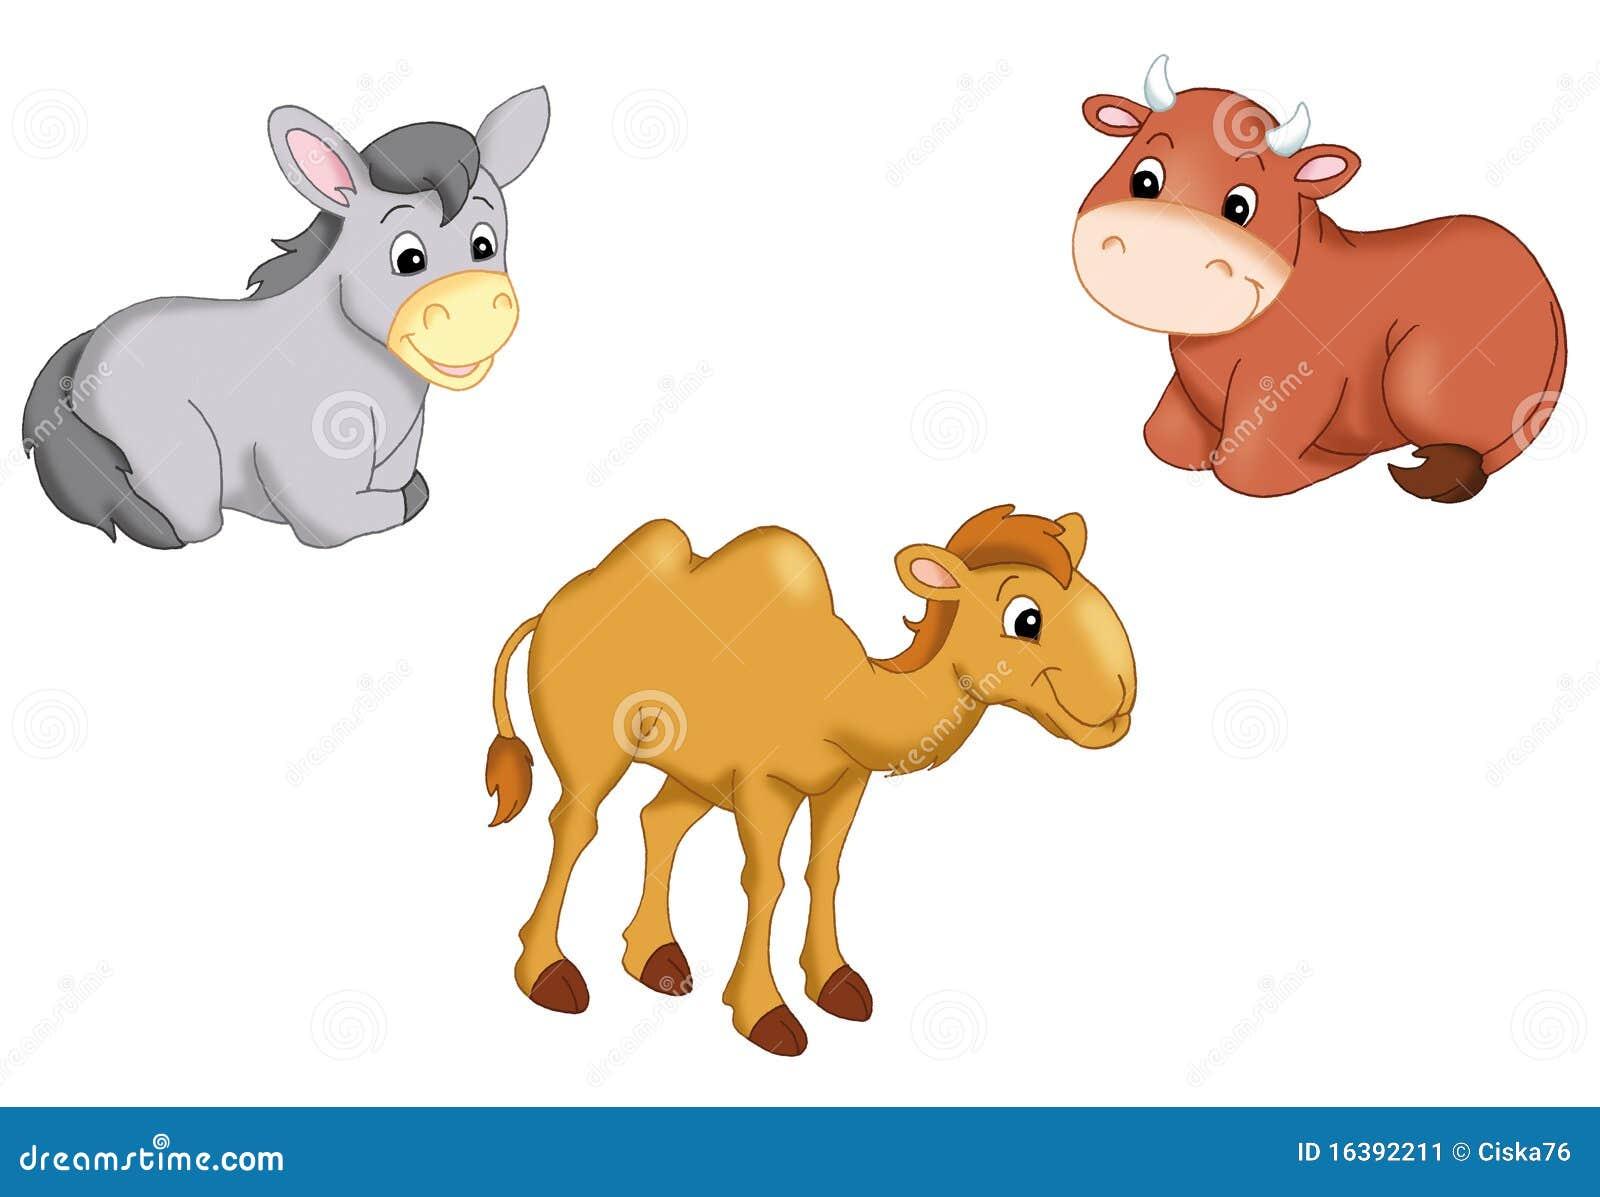 Digital illustration of some animals of the manger